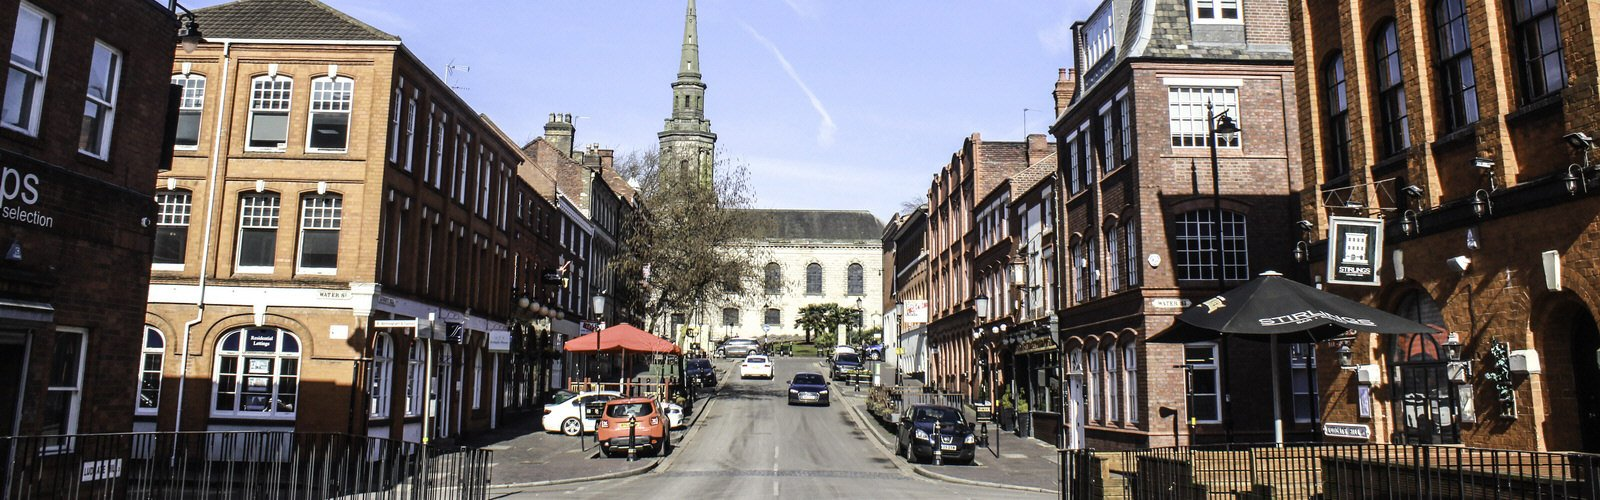 Birmingham Jewellery Quarter Jewellery Shops In